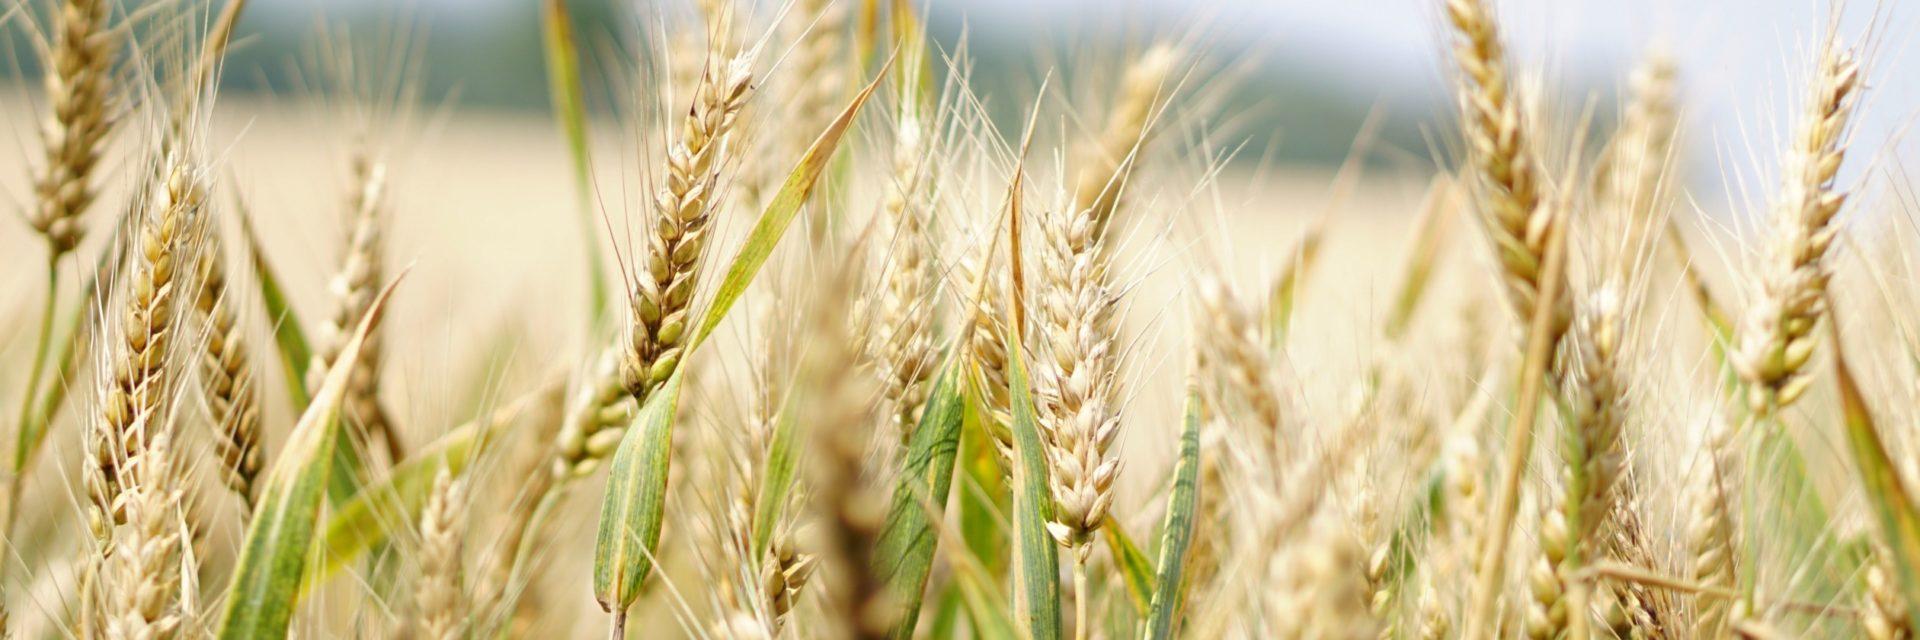 Agriculture Arable Barley Blur 265216